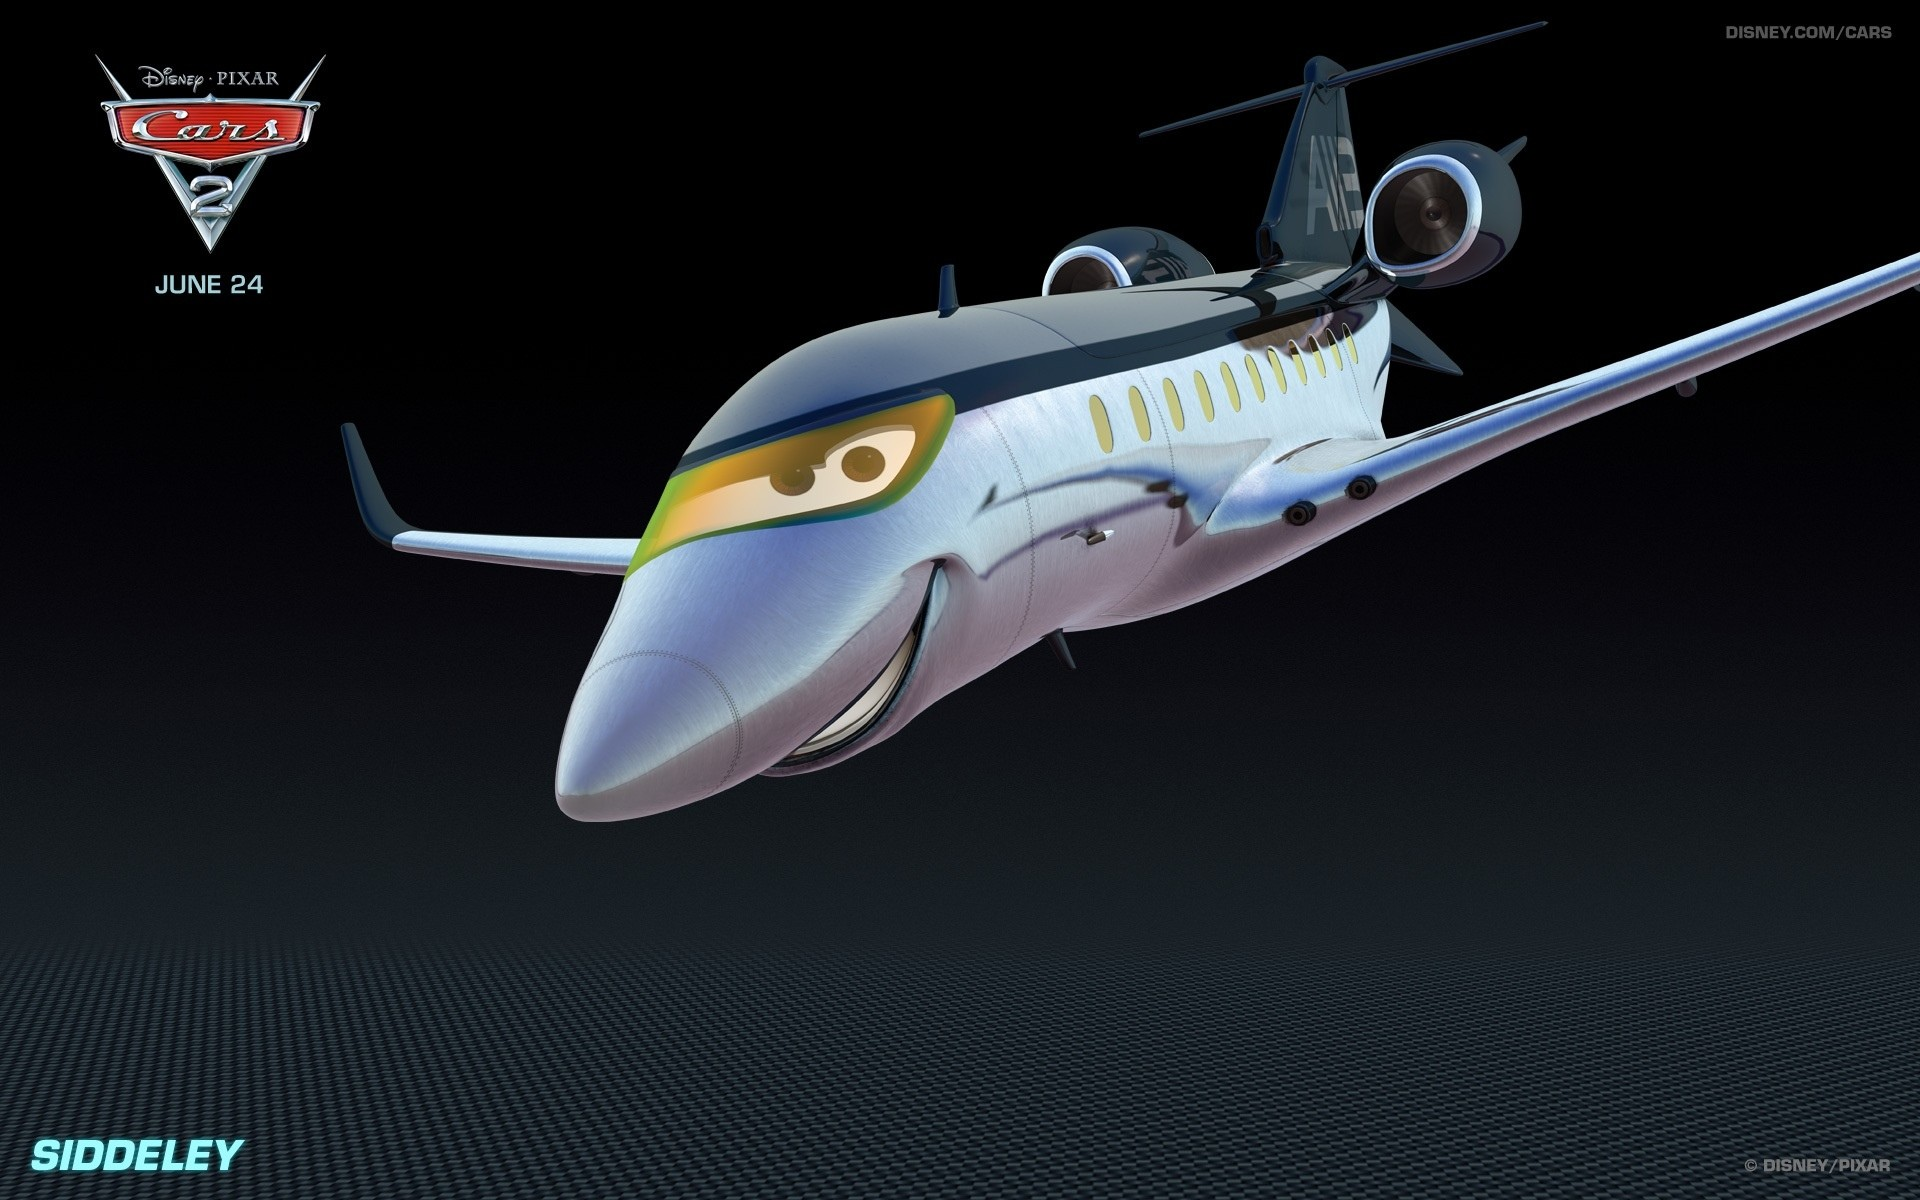 Siddeley avion espion britannique